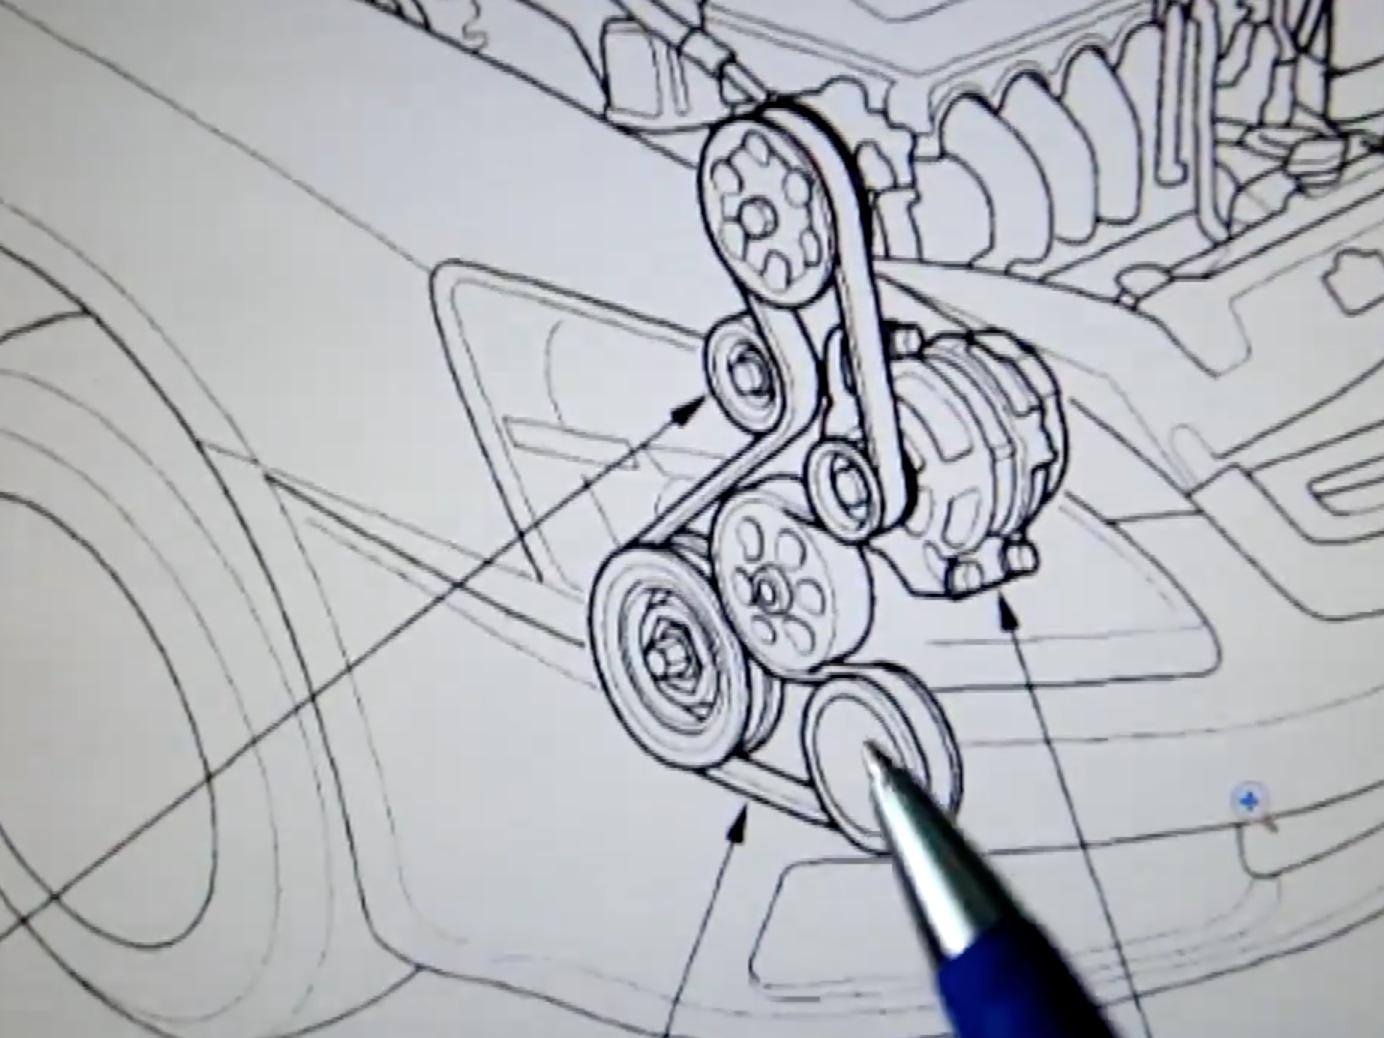 2004 accord belt diagram schematics wiring diagrams \u2022 1996 honda accord timing marks 2003 2007 honda accord serpentine belt replacement 2003 2004 2005 rh ifixit com 2004 accord timing belt replacement 2004 accord timing belt replacement